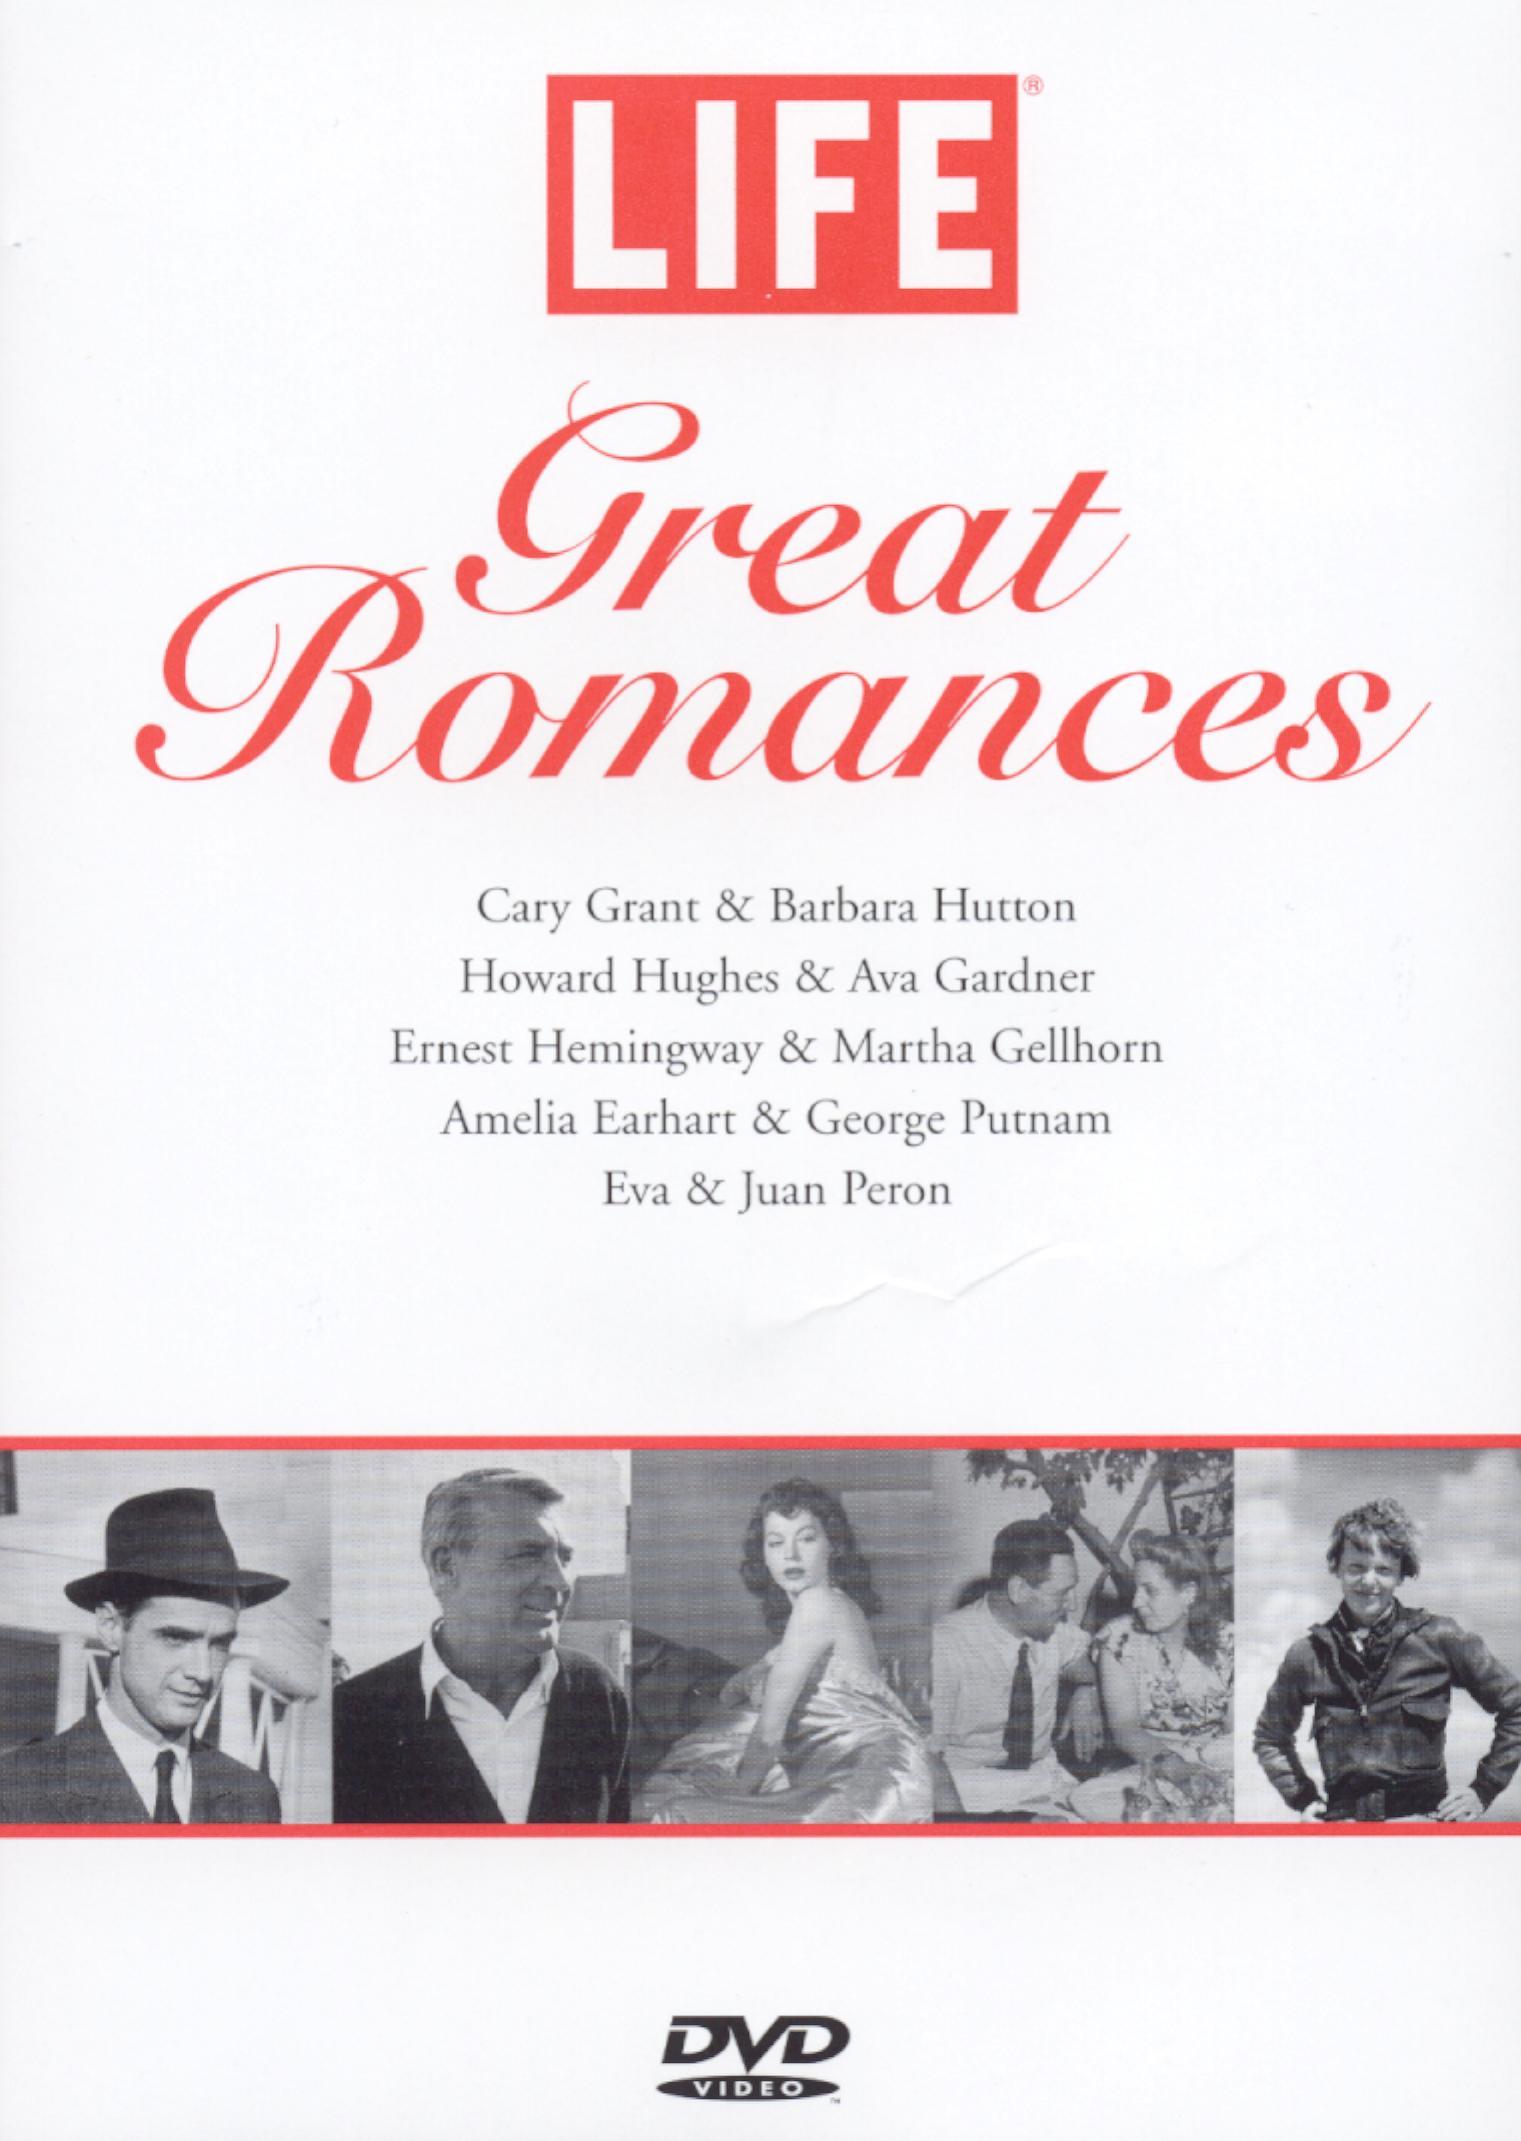 LIFE: Great Romances, Vol. 3